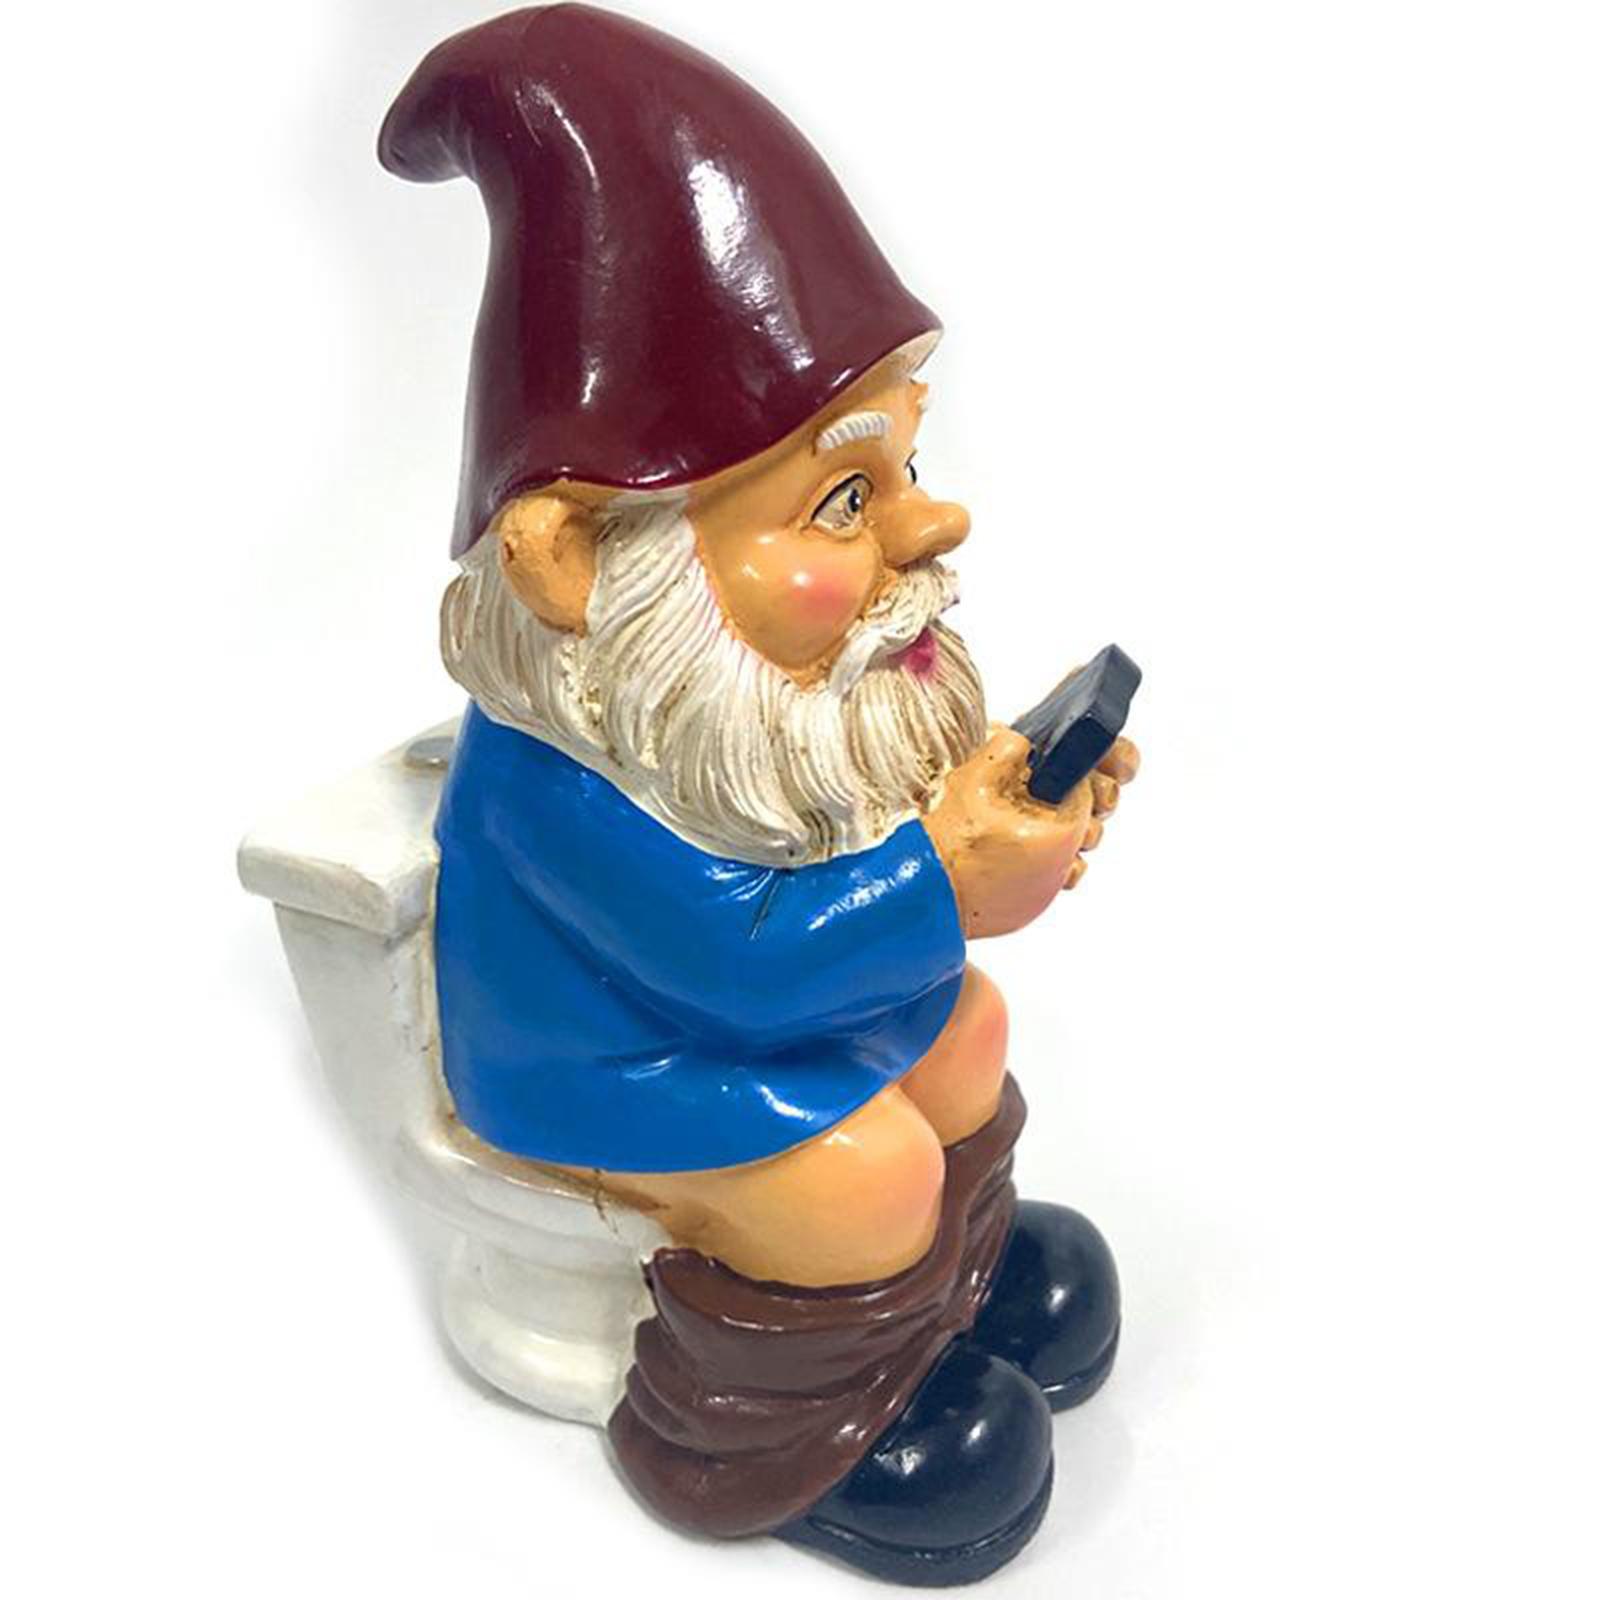 thumbnail 34 - Funny Resin Naughty Garden Gnome Statue Ornaments Villa Home Figurines Decor